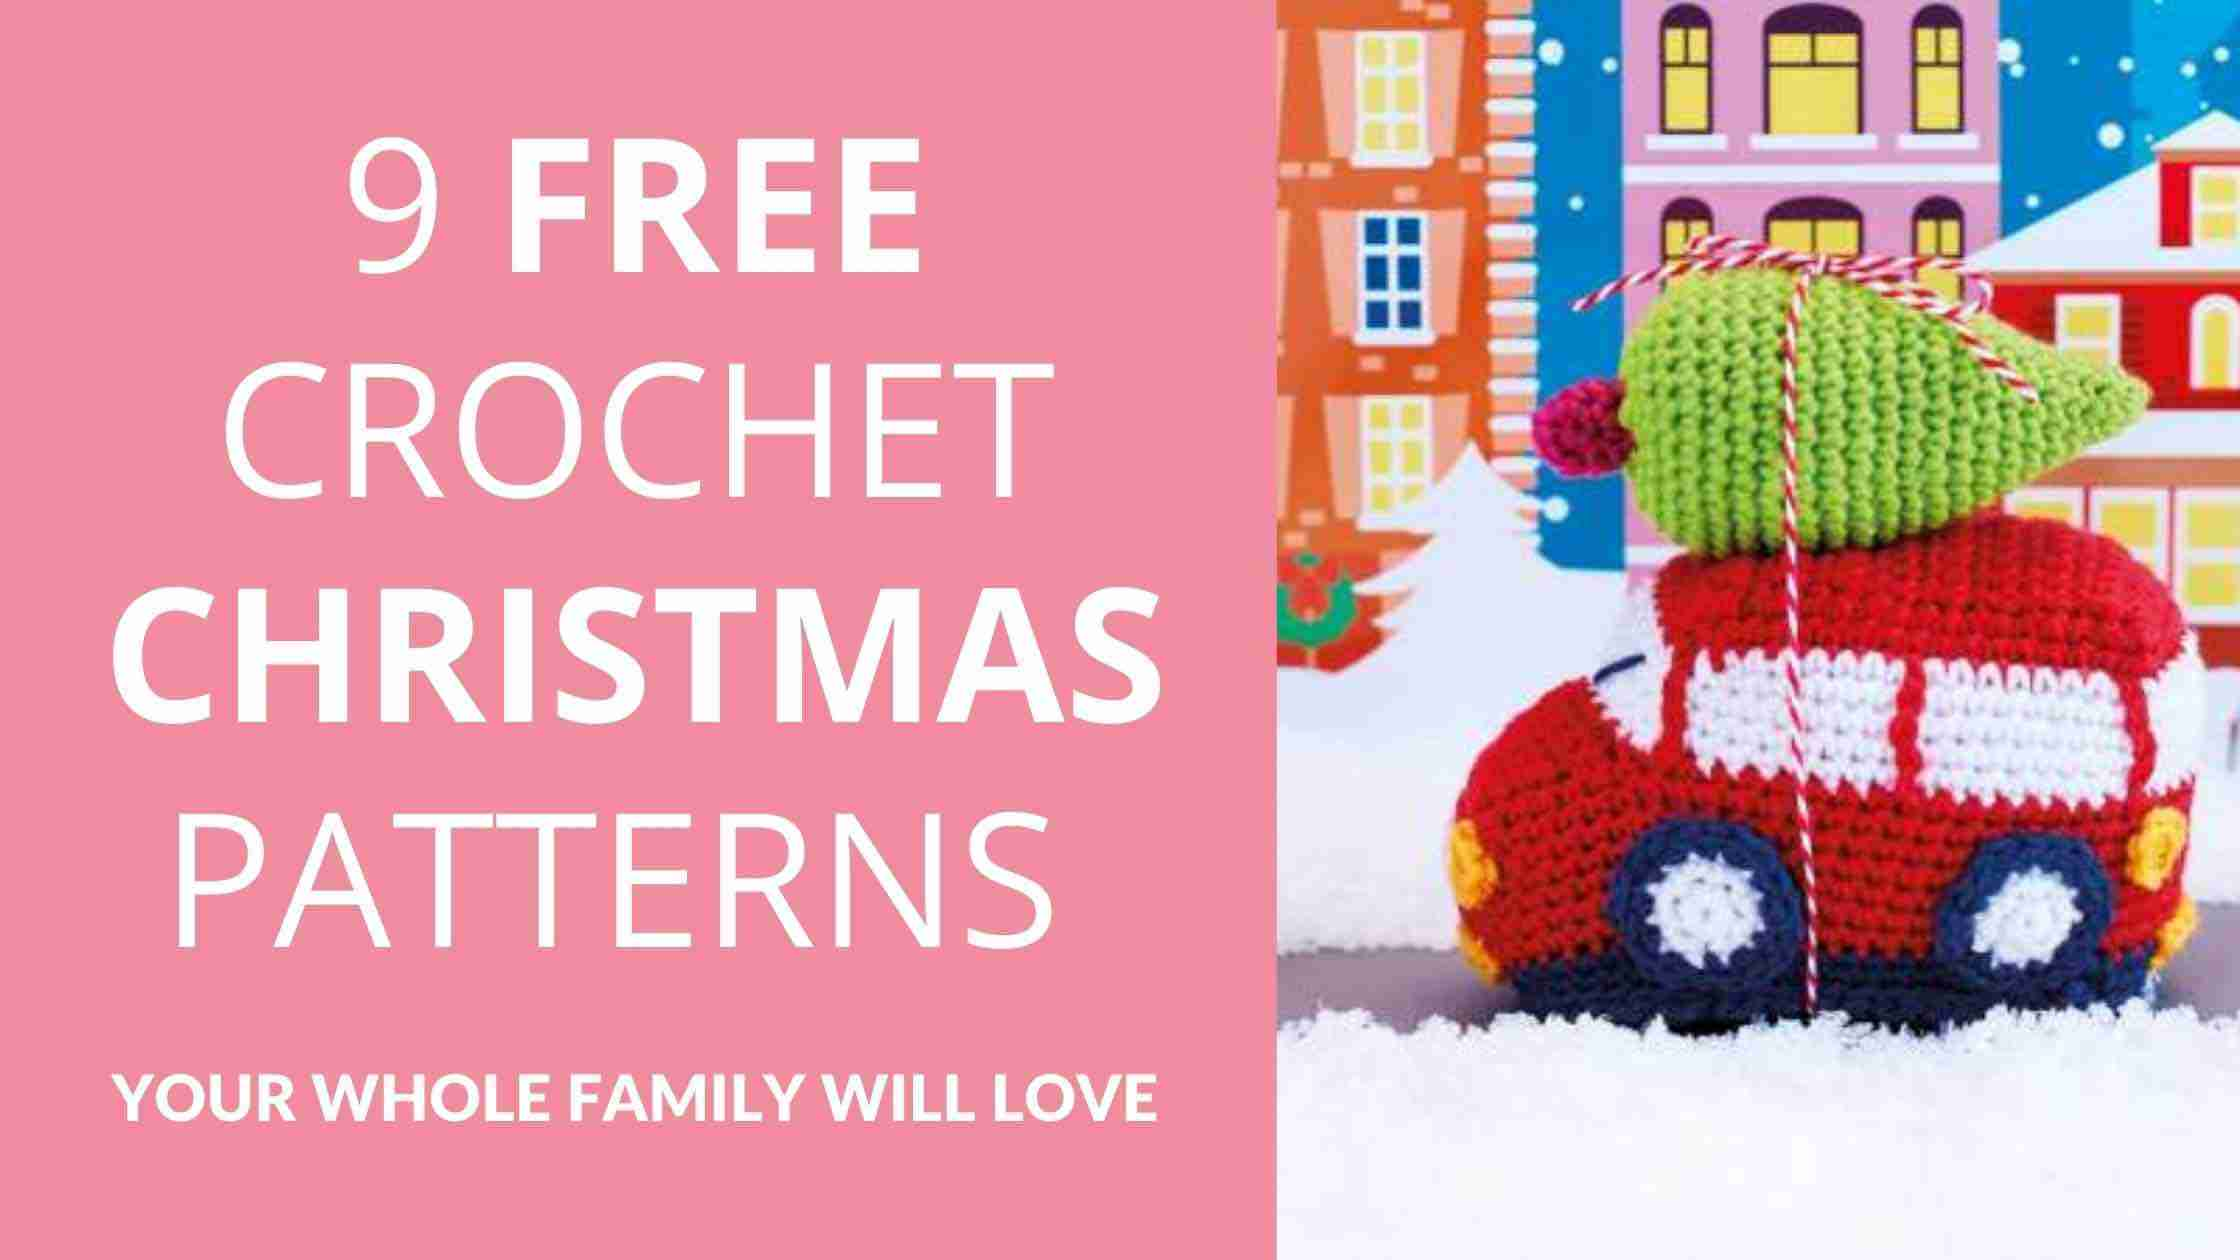 Free Crochet Christmas Patterns - Start Crochet